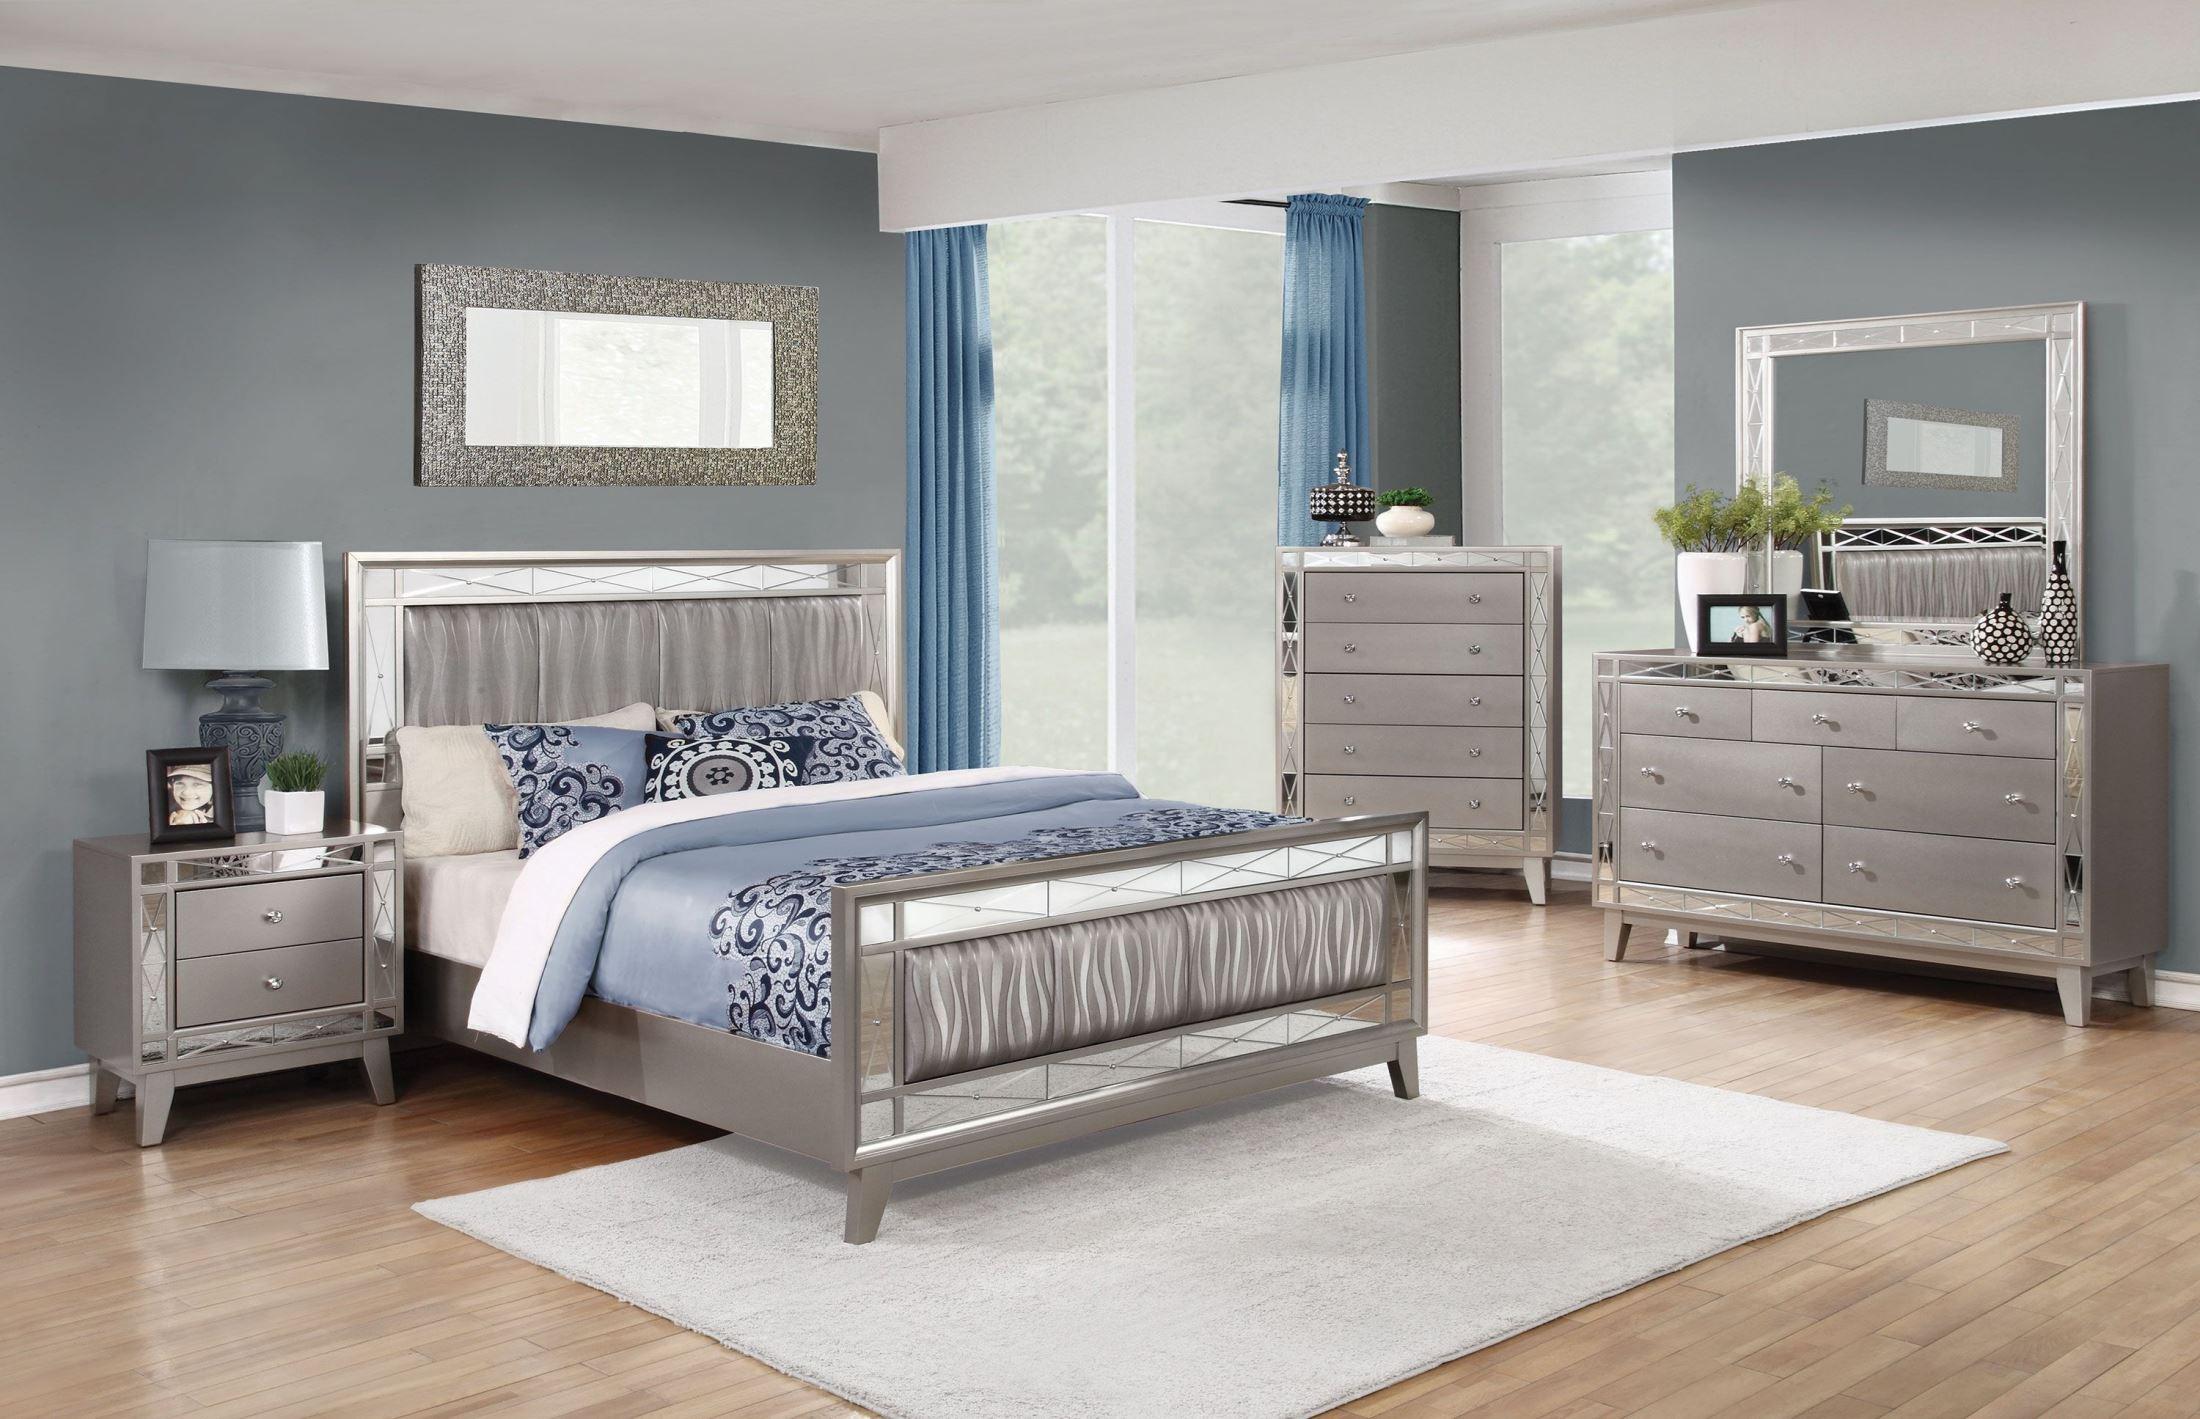 Leighton Metallic Mercury Vanity Desk and Stool Coaster Furniture